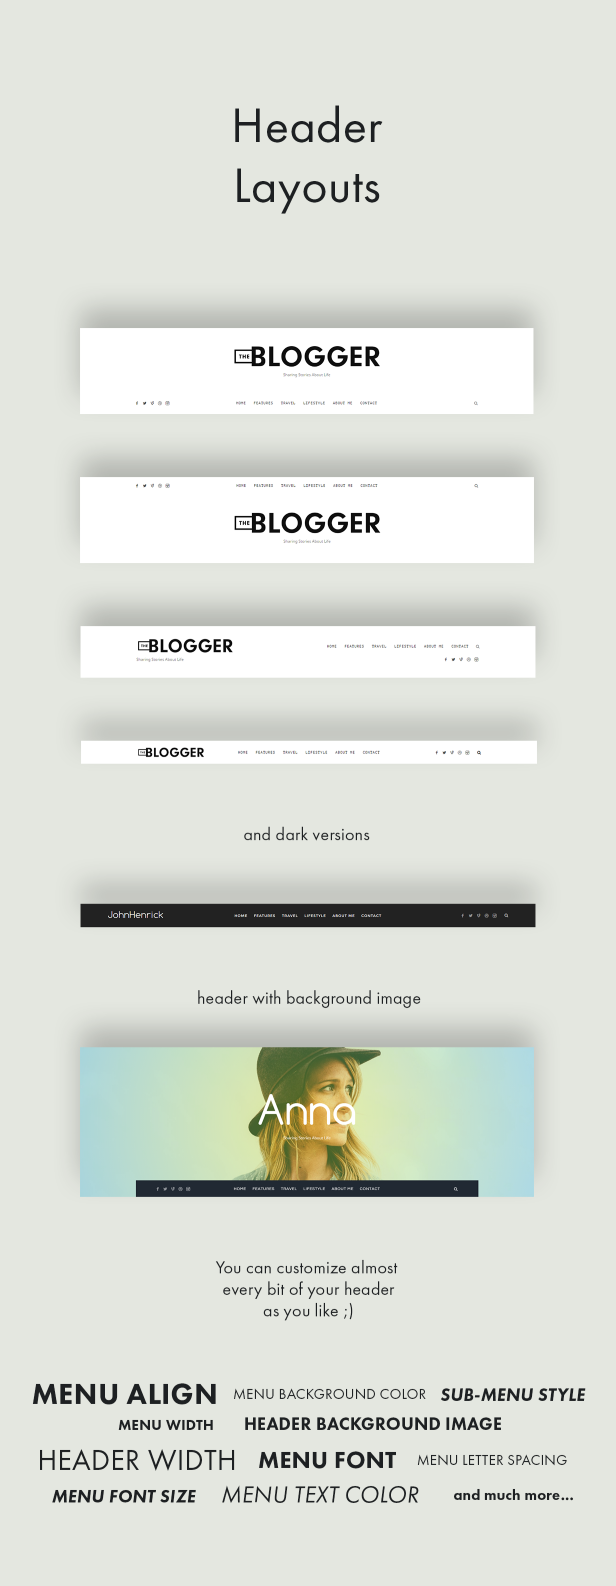 theblogger header layouts